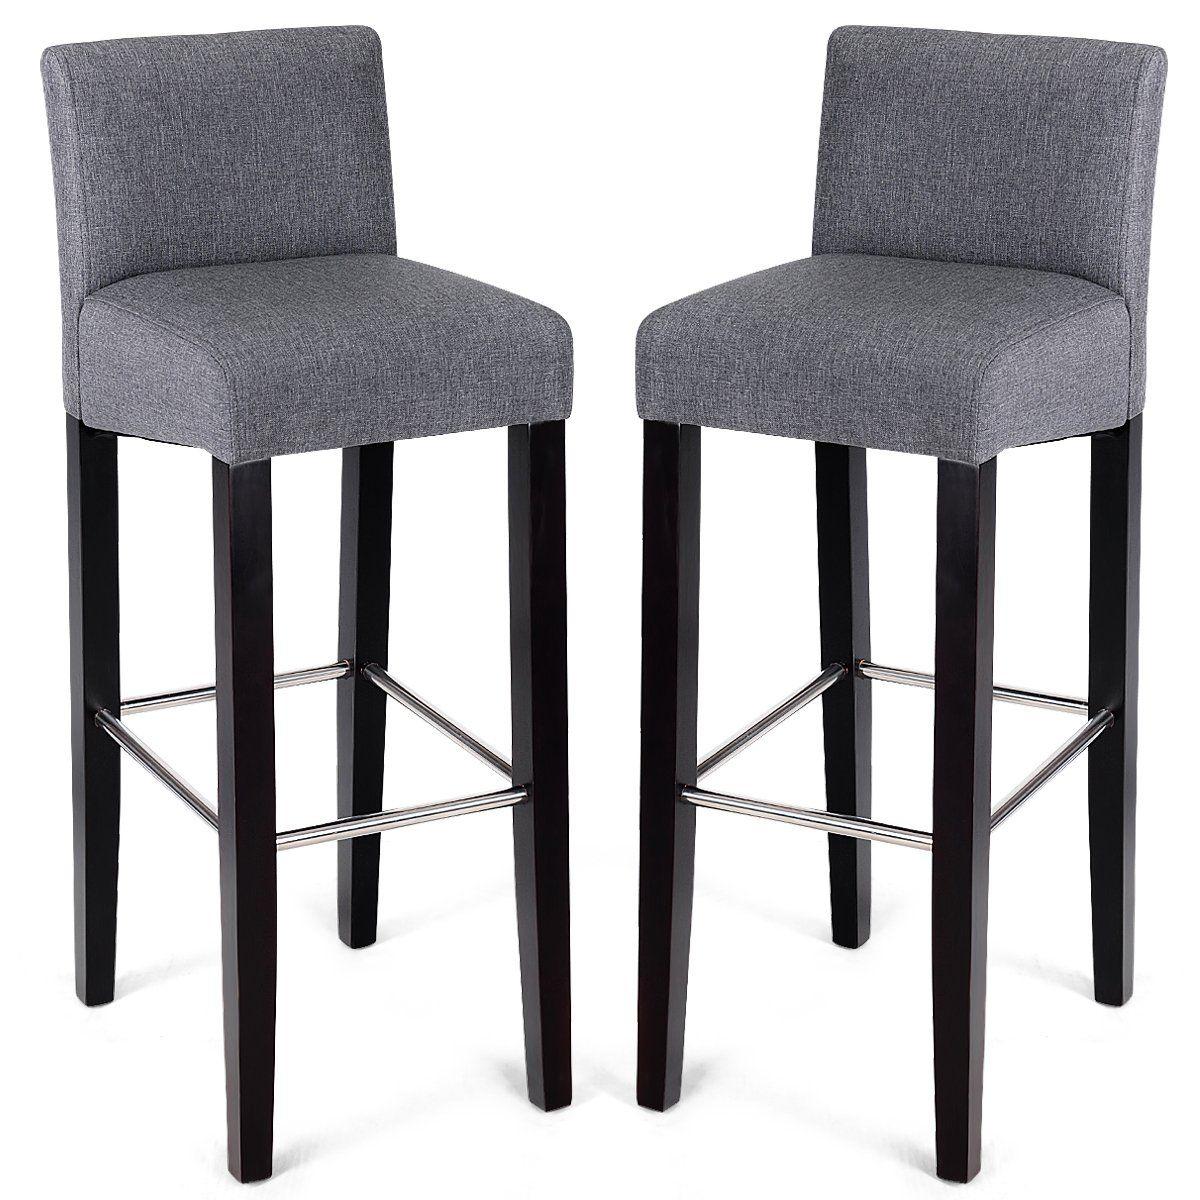 Barbuda Grey Tufted Bar Stool Upholstered Vintage Linen Mdn Upholstered Bar Stools Bar Stools Leather Dining